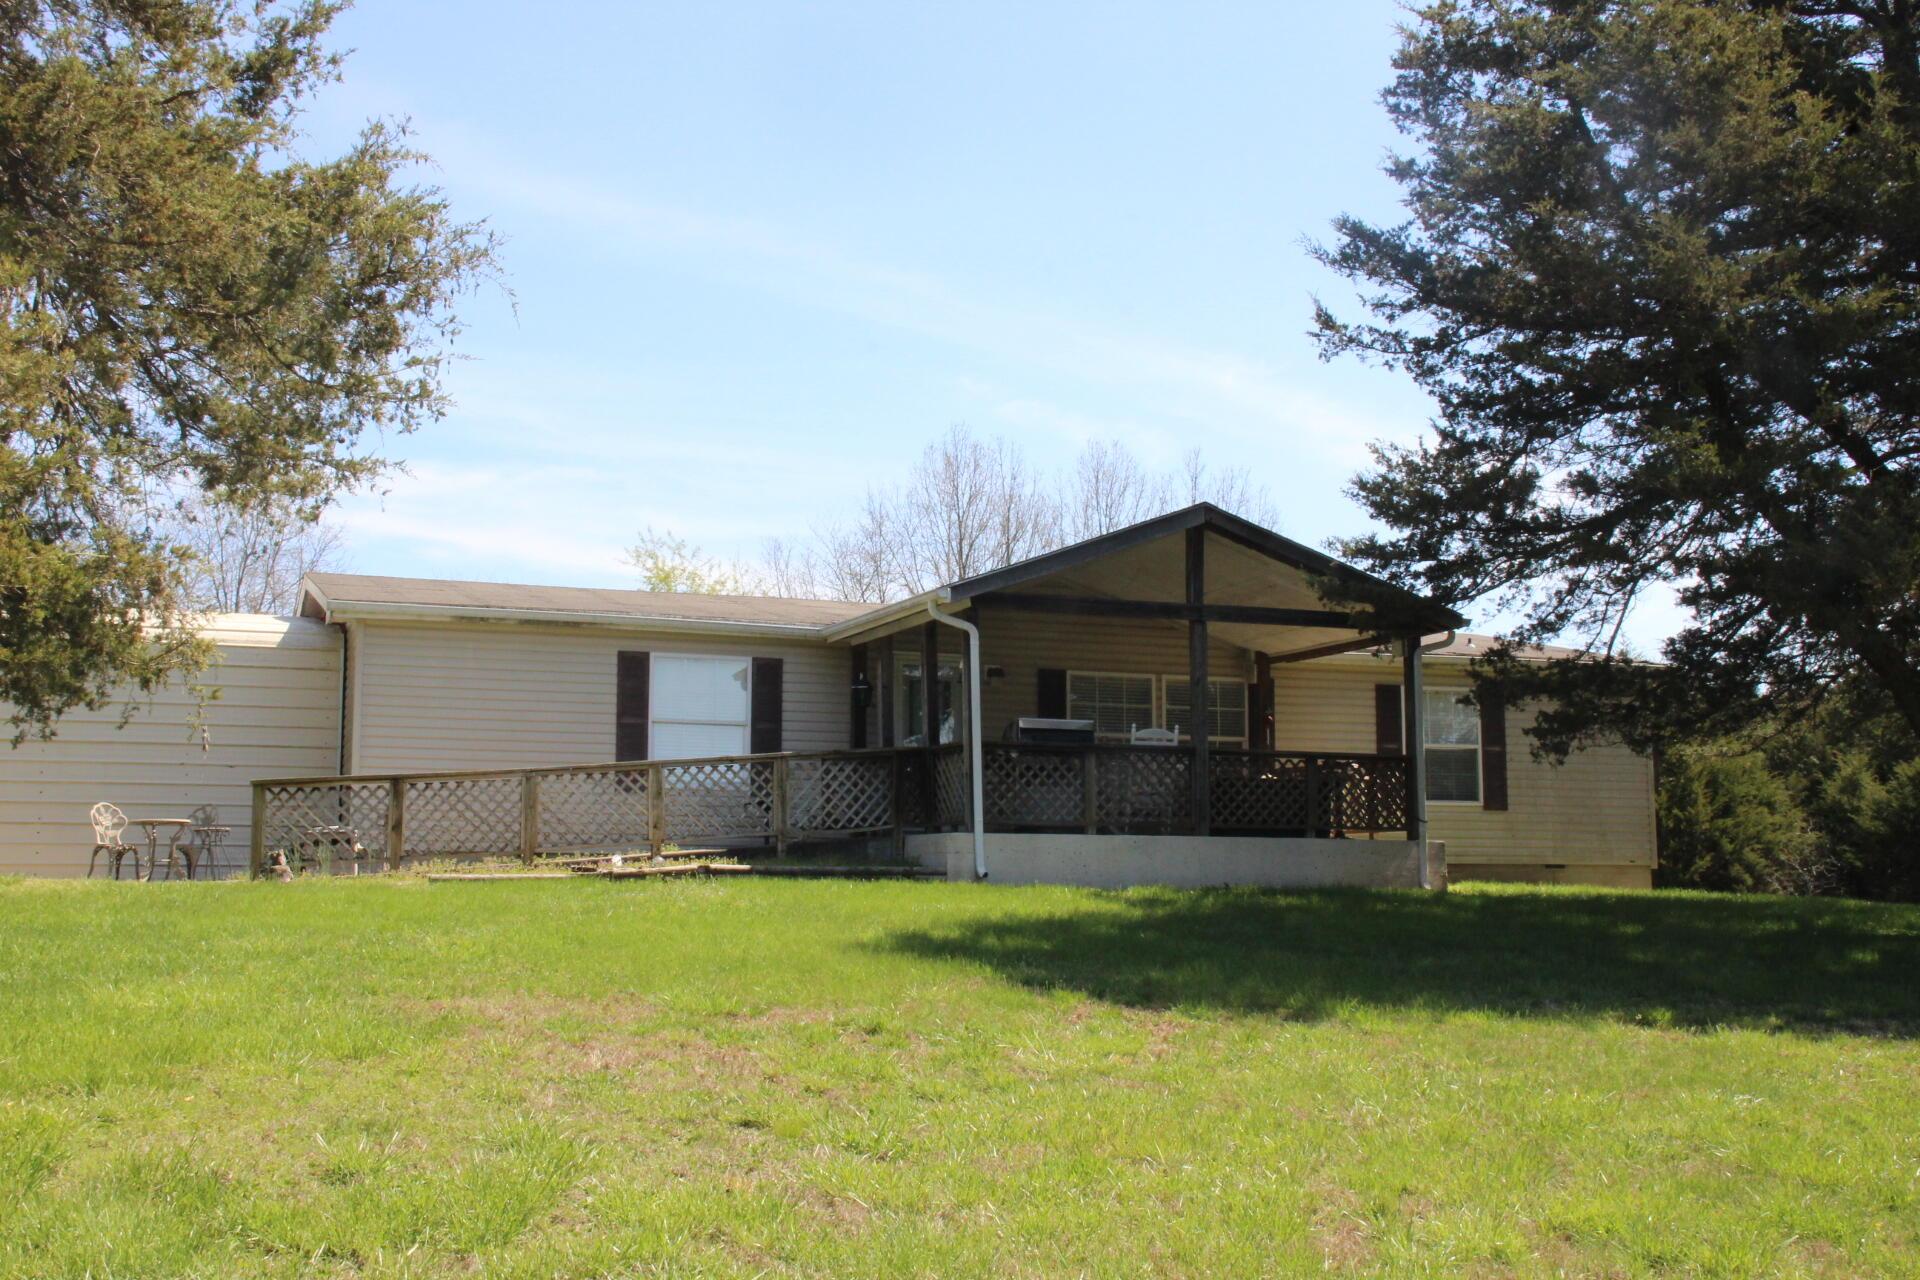 address: 19796  County Road 270